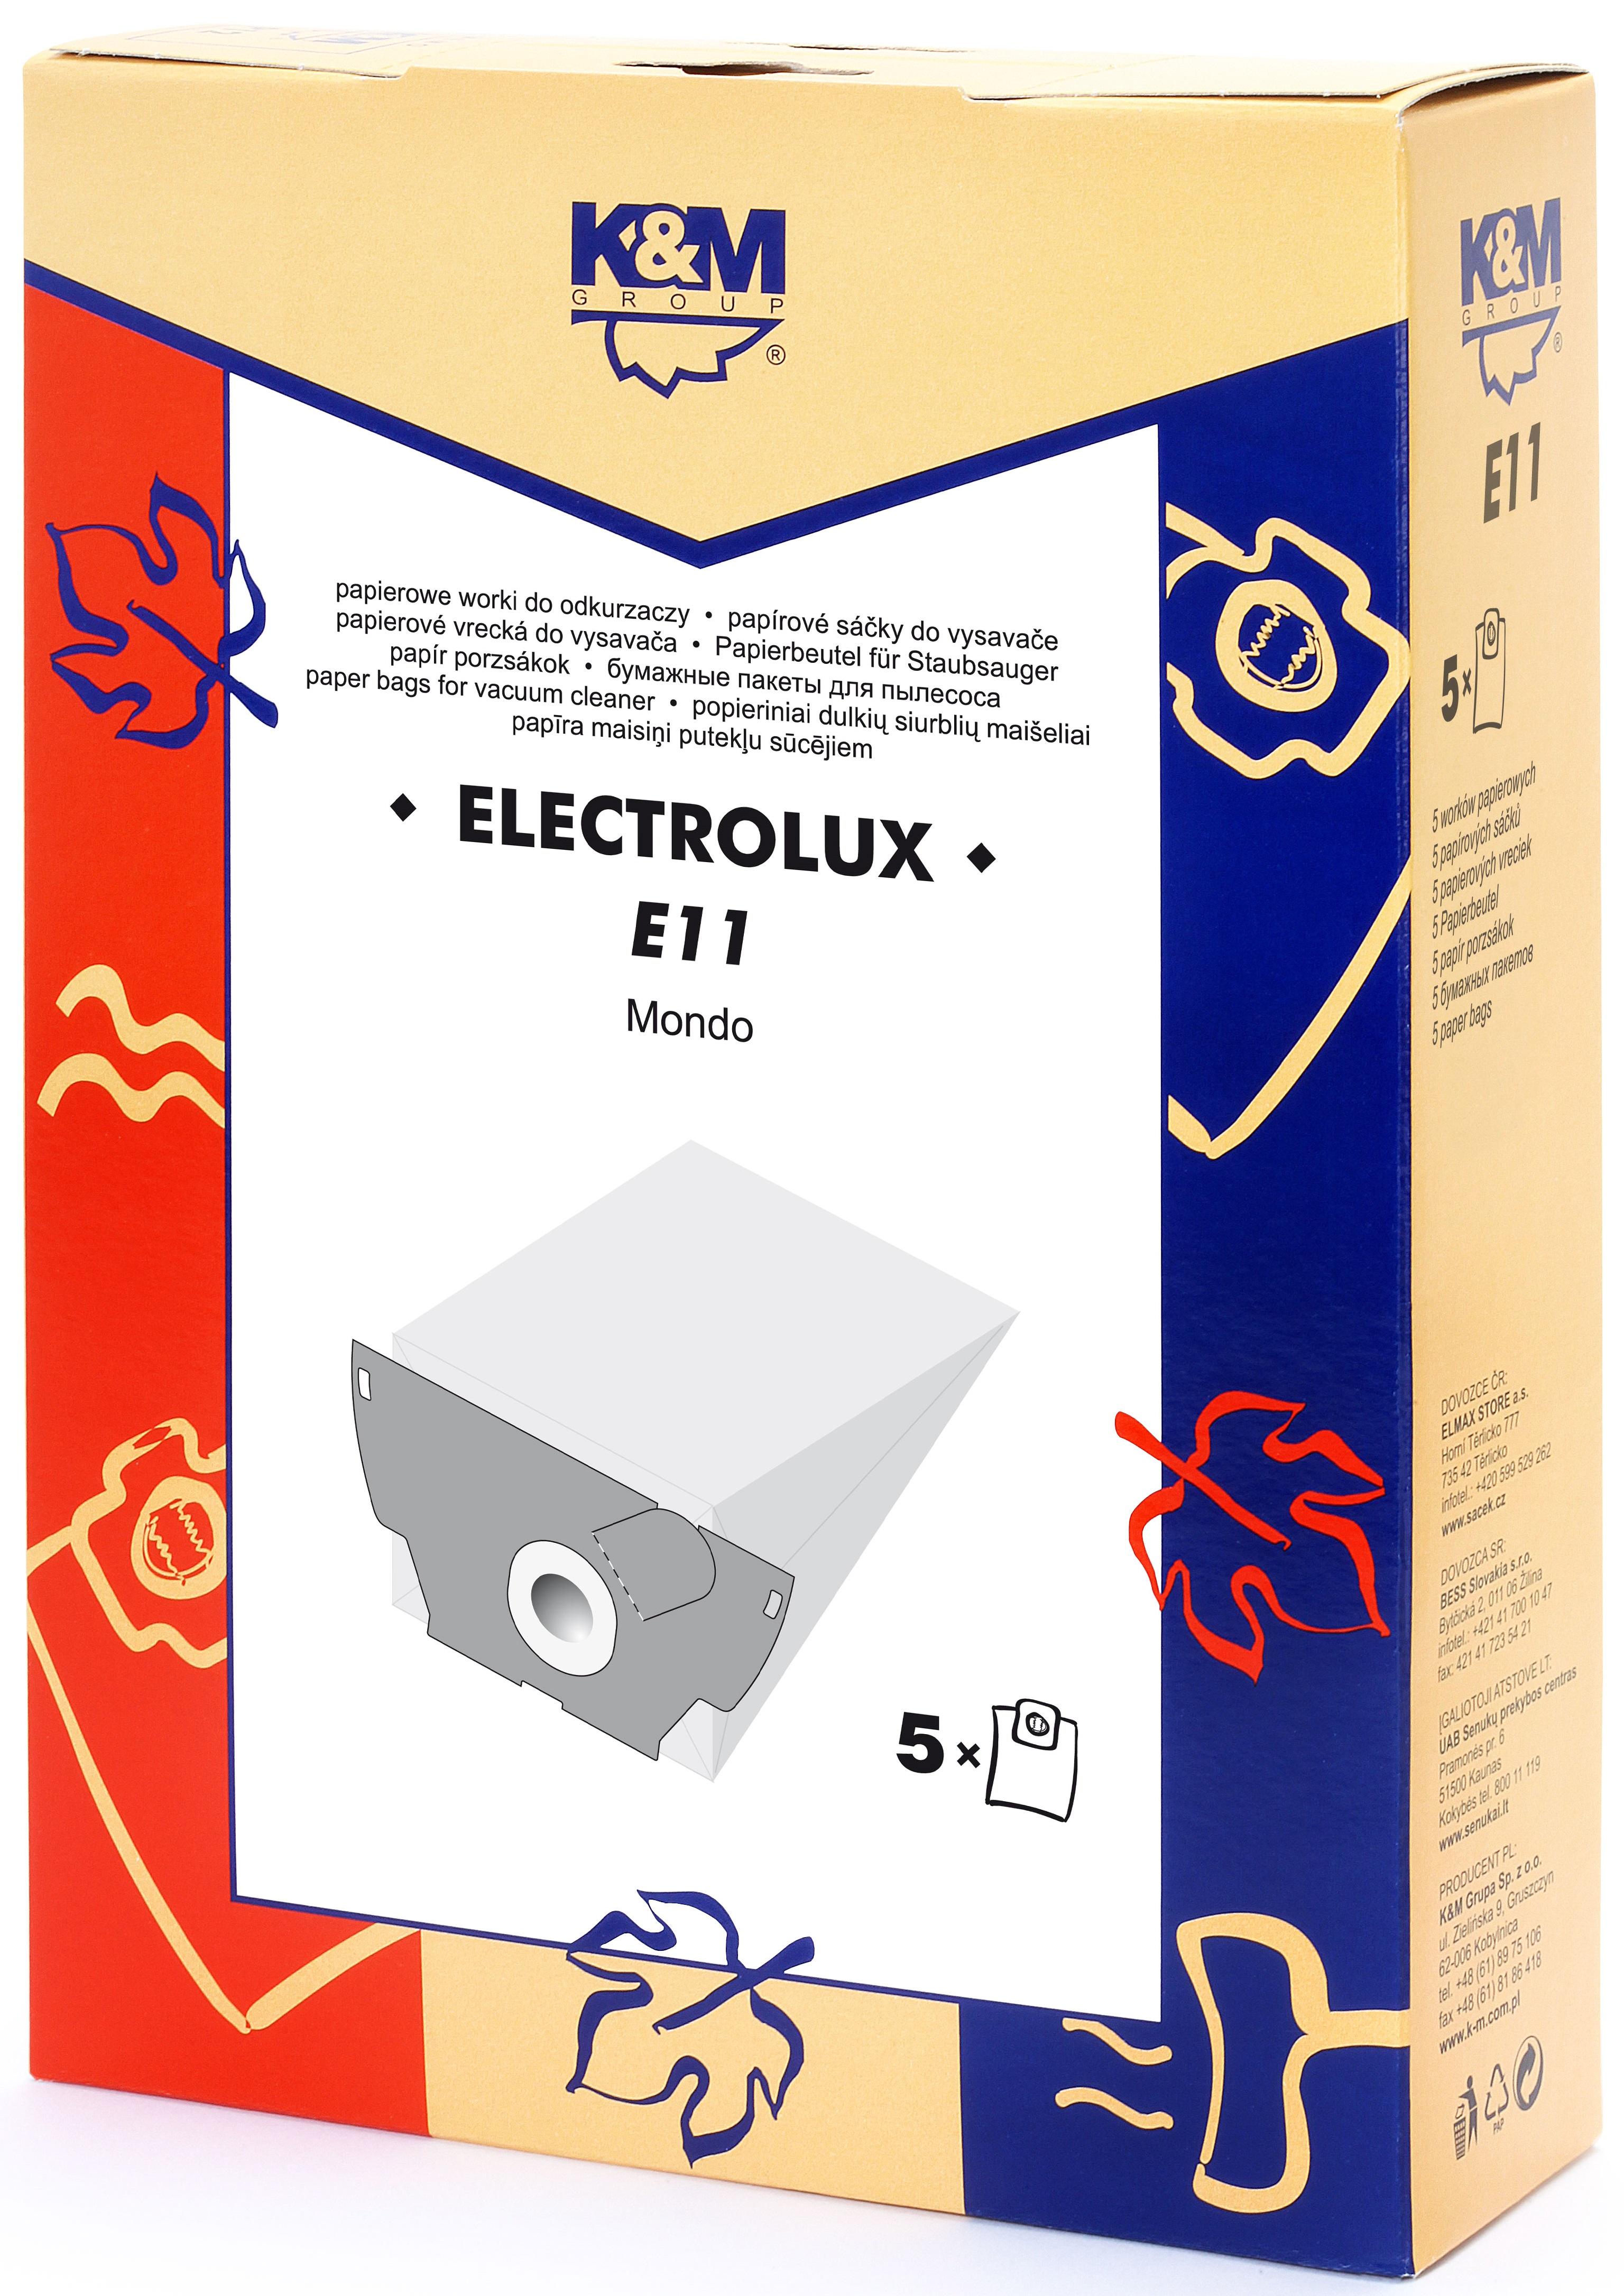 Sac aspirator Electrolux Mondo, hartie, 5X saci, K&M 0